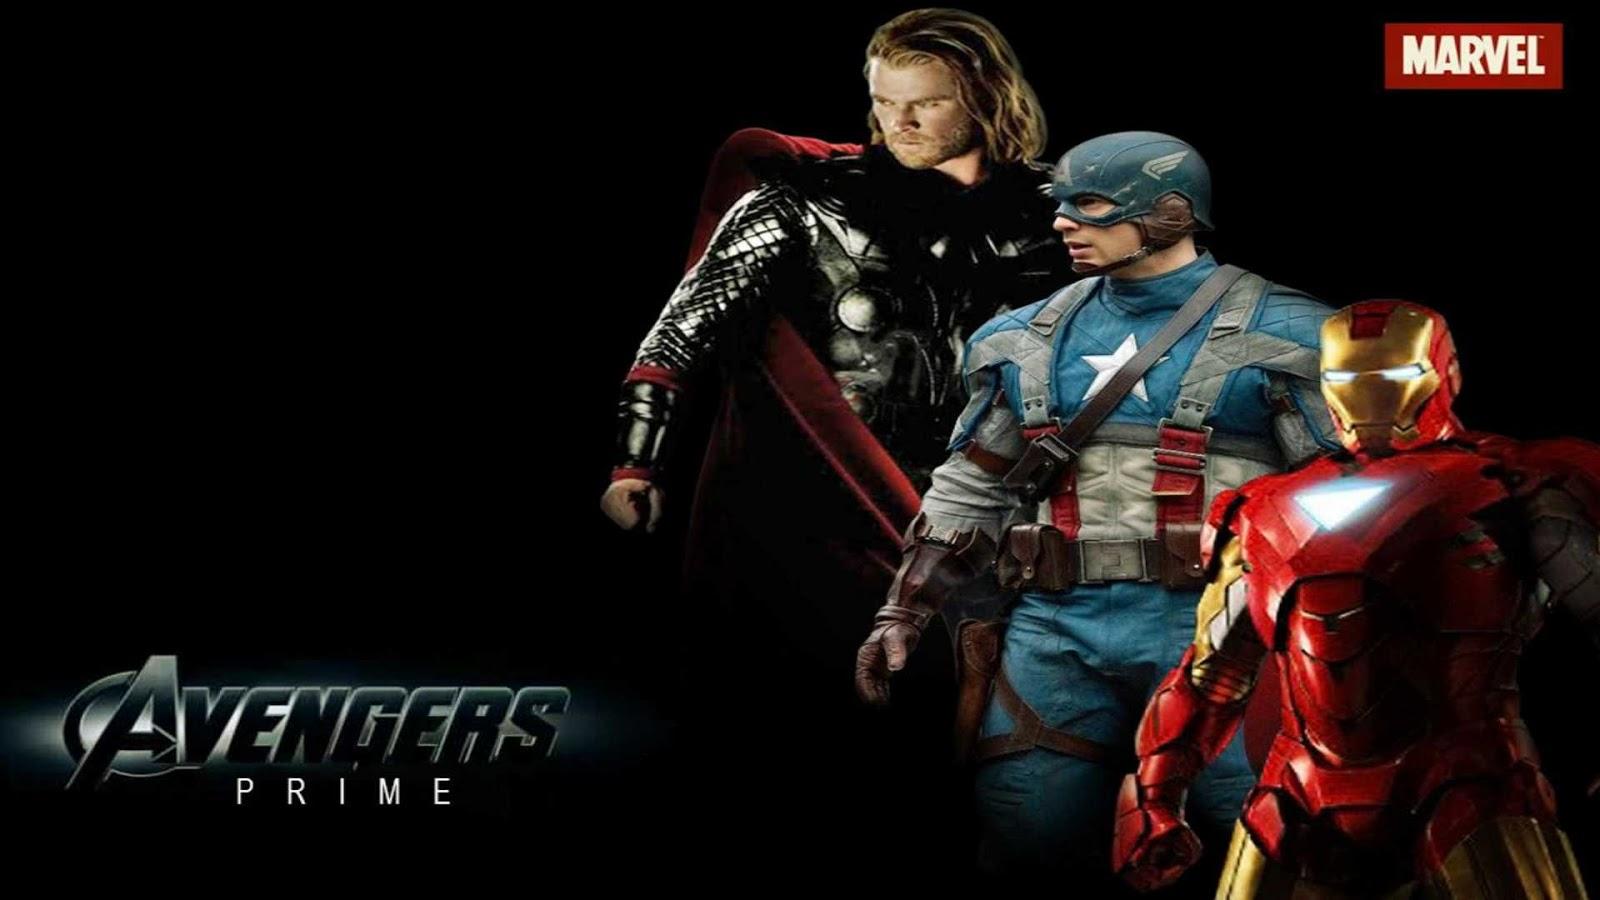 Avengers wallpaper 1920x1080